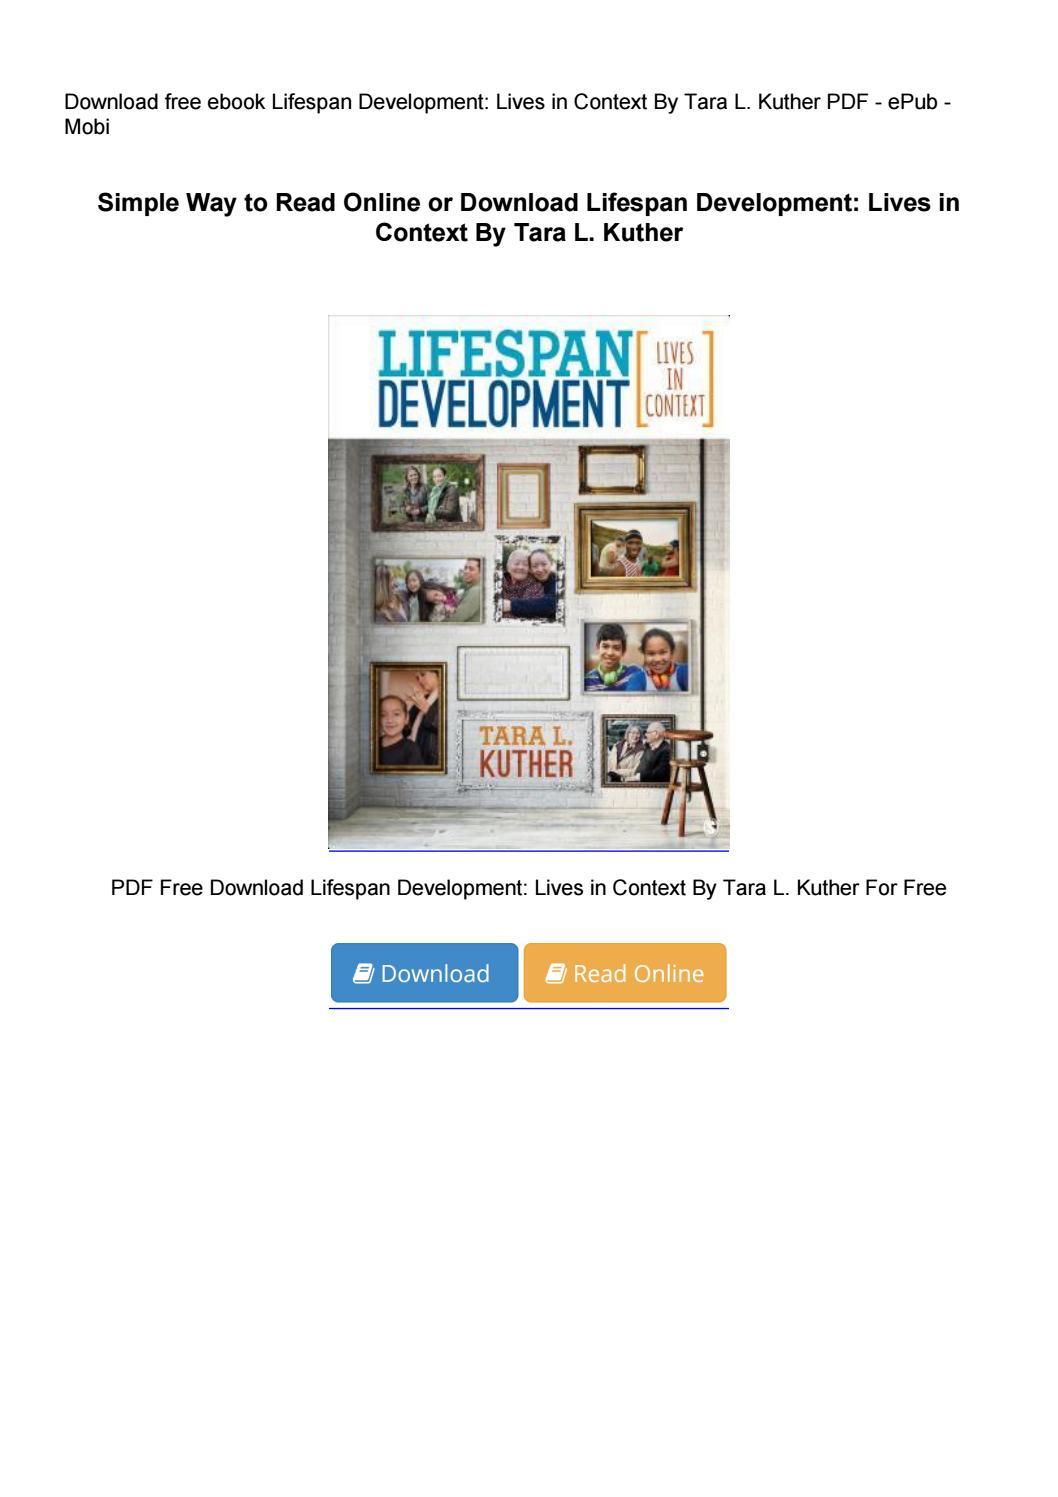 lifespan development lives in context pdf free